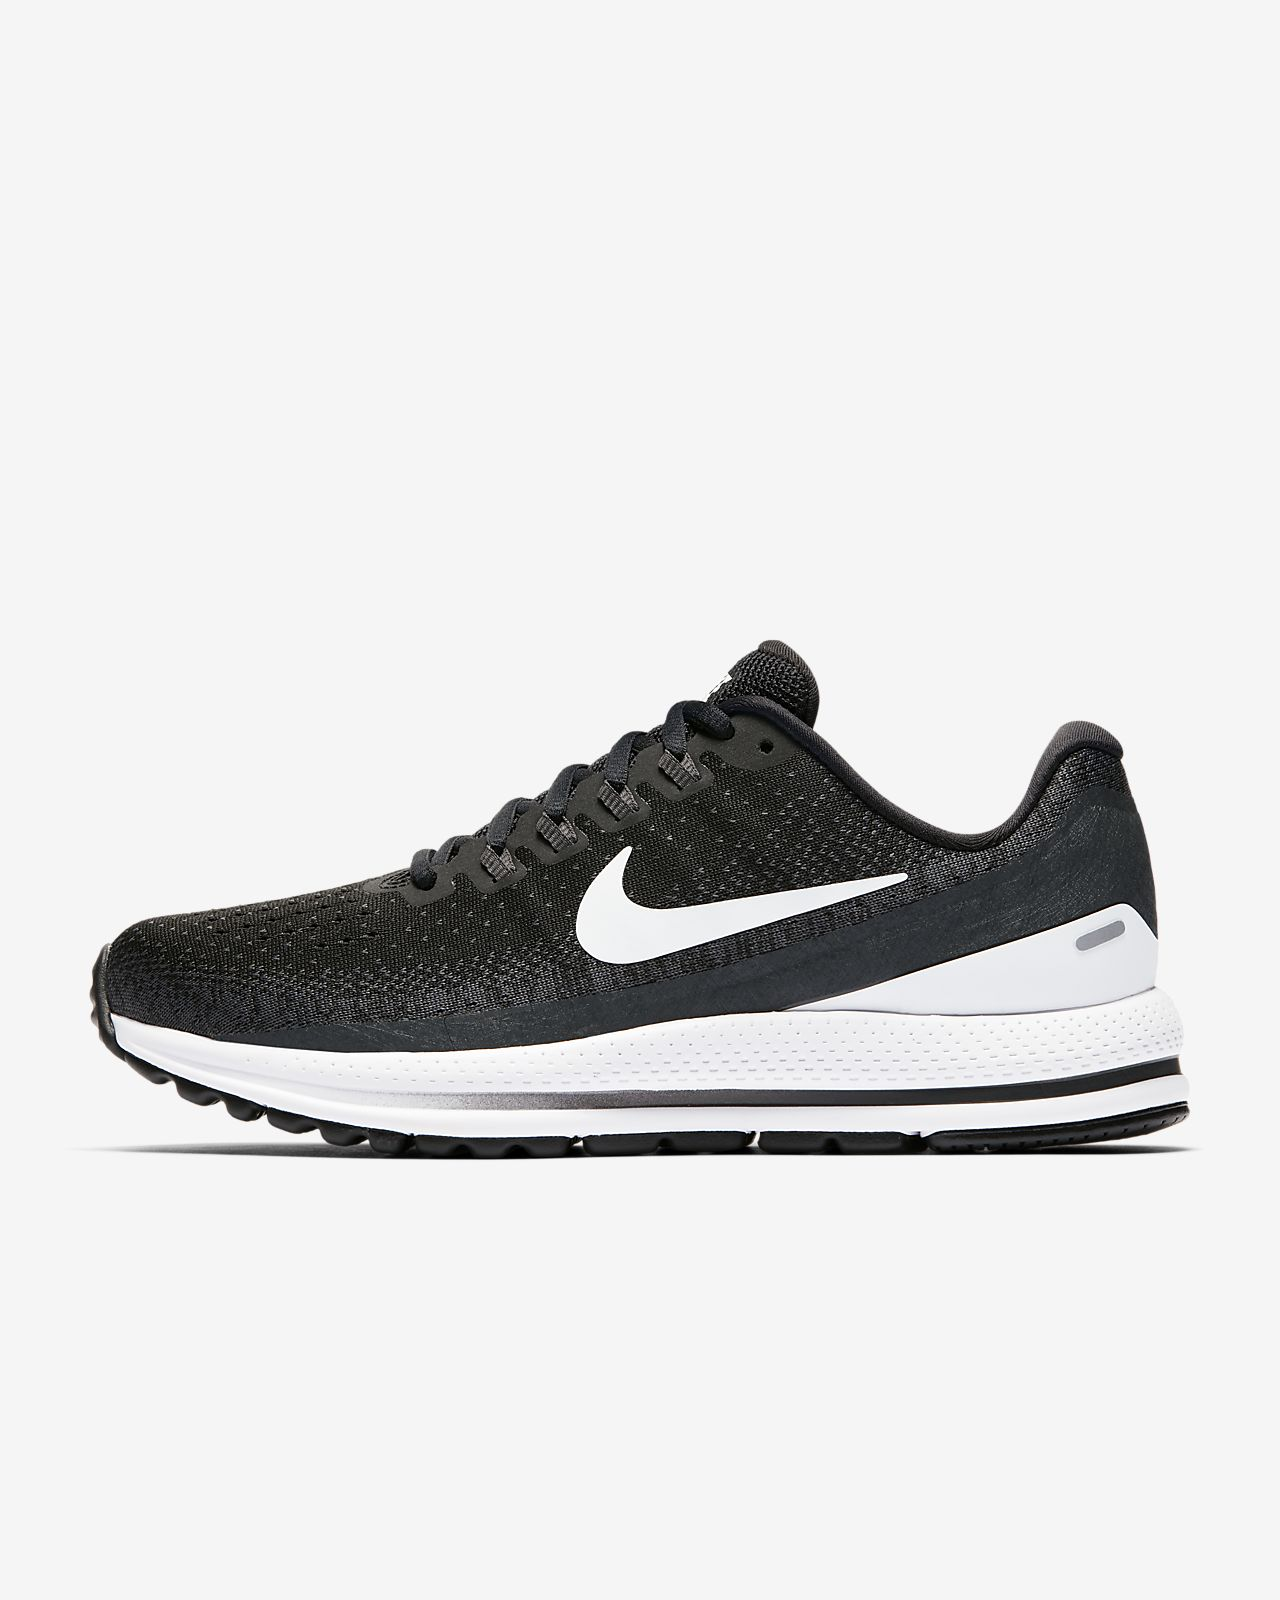 nike soldes running, Nike Zoom Vomero Femme Nike Running